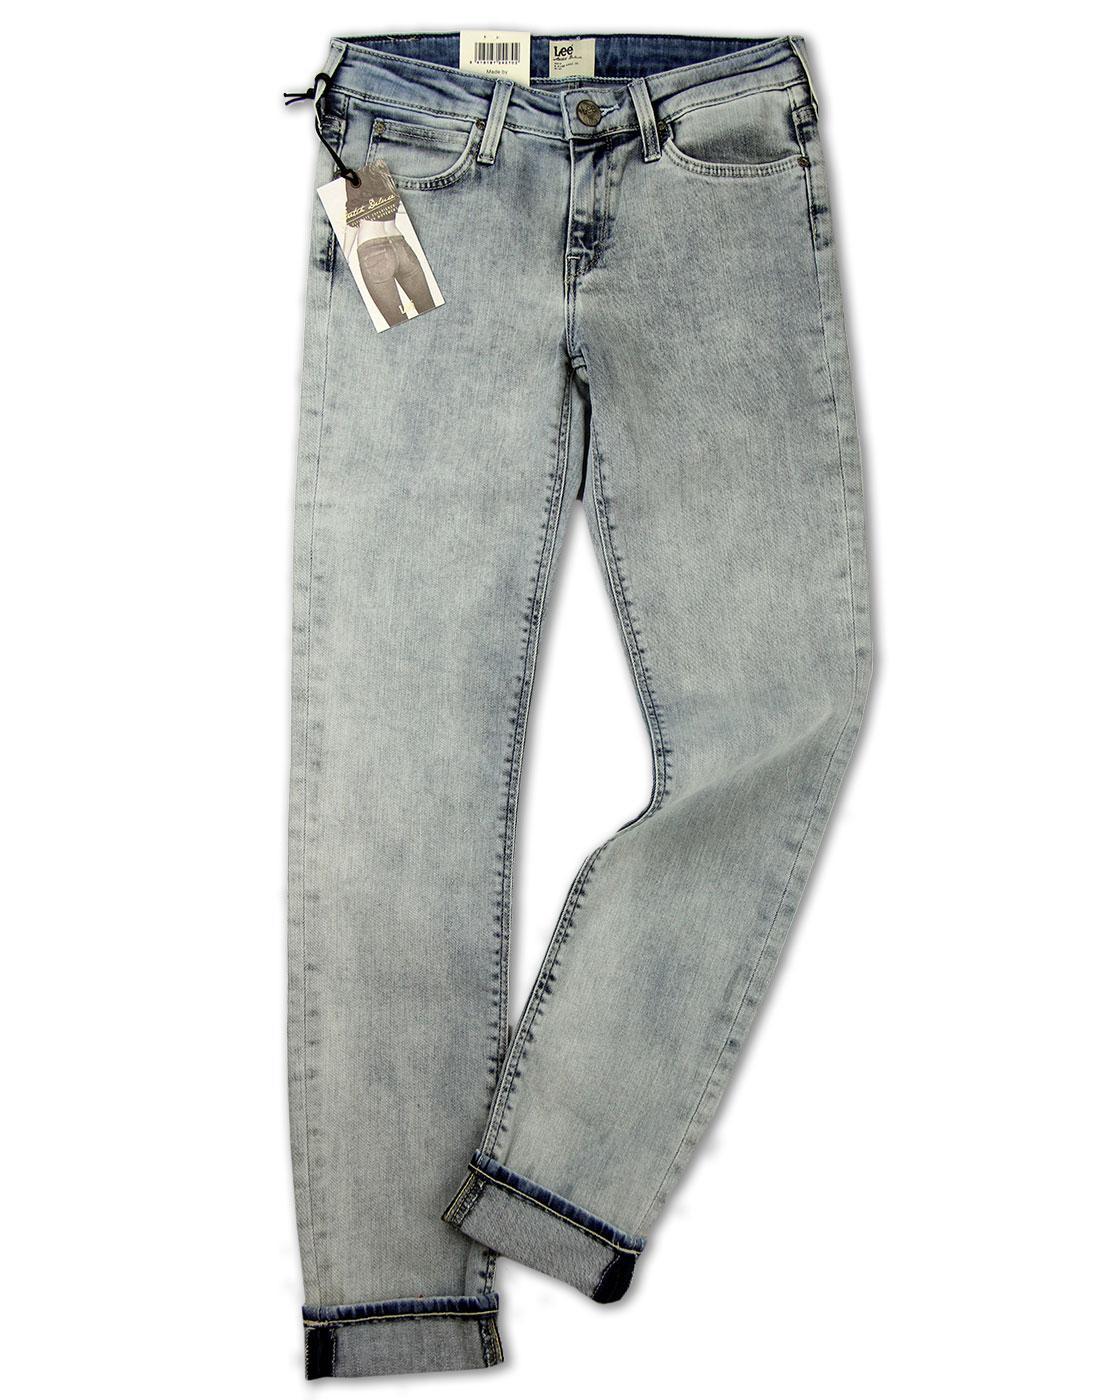 Scarlett LEE Stretch Deluxe Retro Skinny Jeans BW